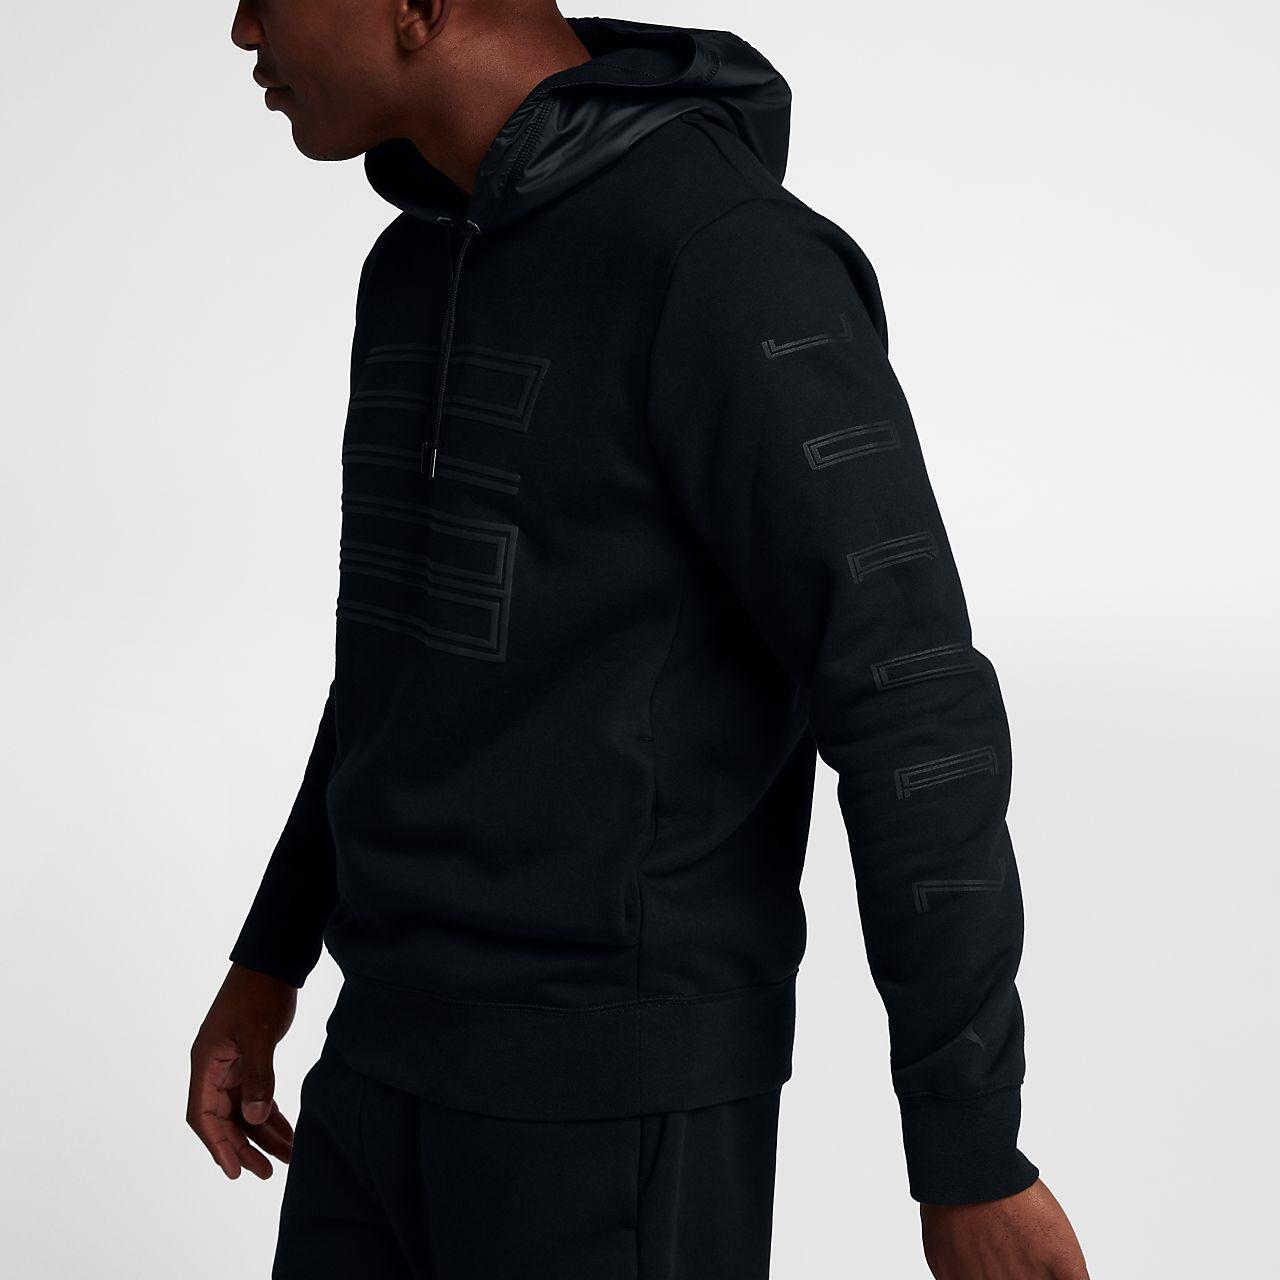 7b571d19bdc Jordan Sportswear AJ 11 Hybrid Mens Hoodie ...